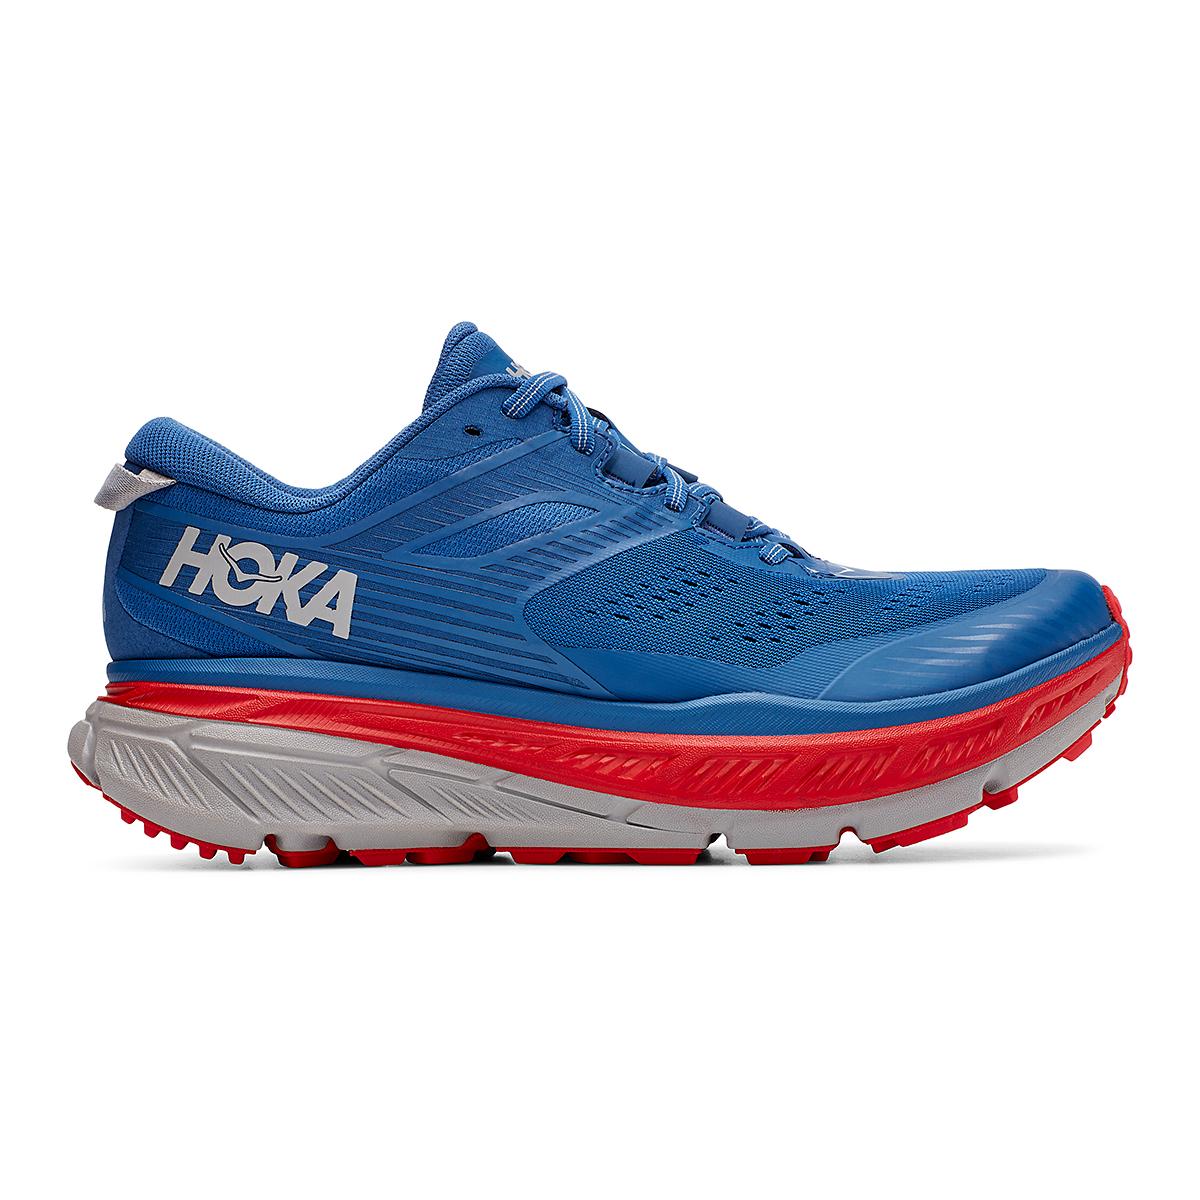 Men's Hoka One One Stinson Atr 6 Trail Running Shoe - Color: Dark Blue/High Risk Red - Size: 7 - Width: Regular, Dark Blue/High Risk Red, large, image 1